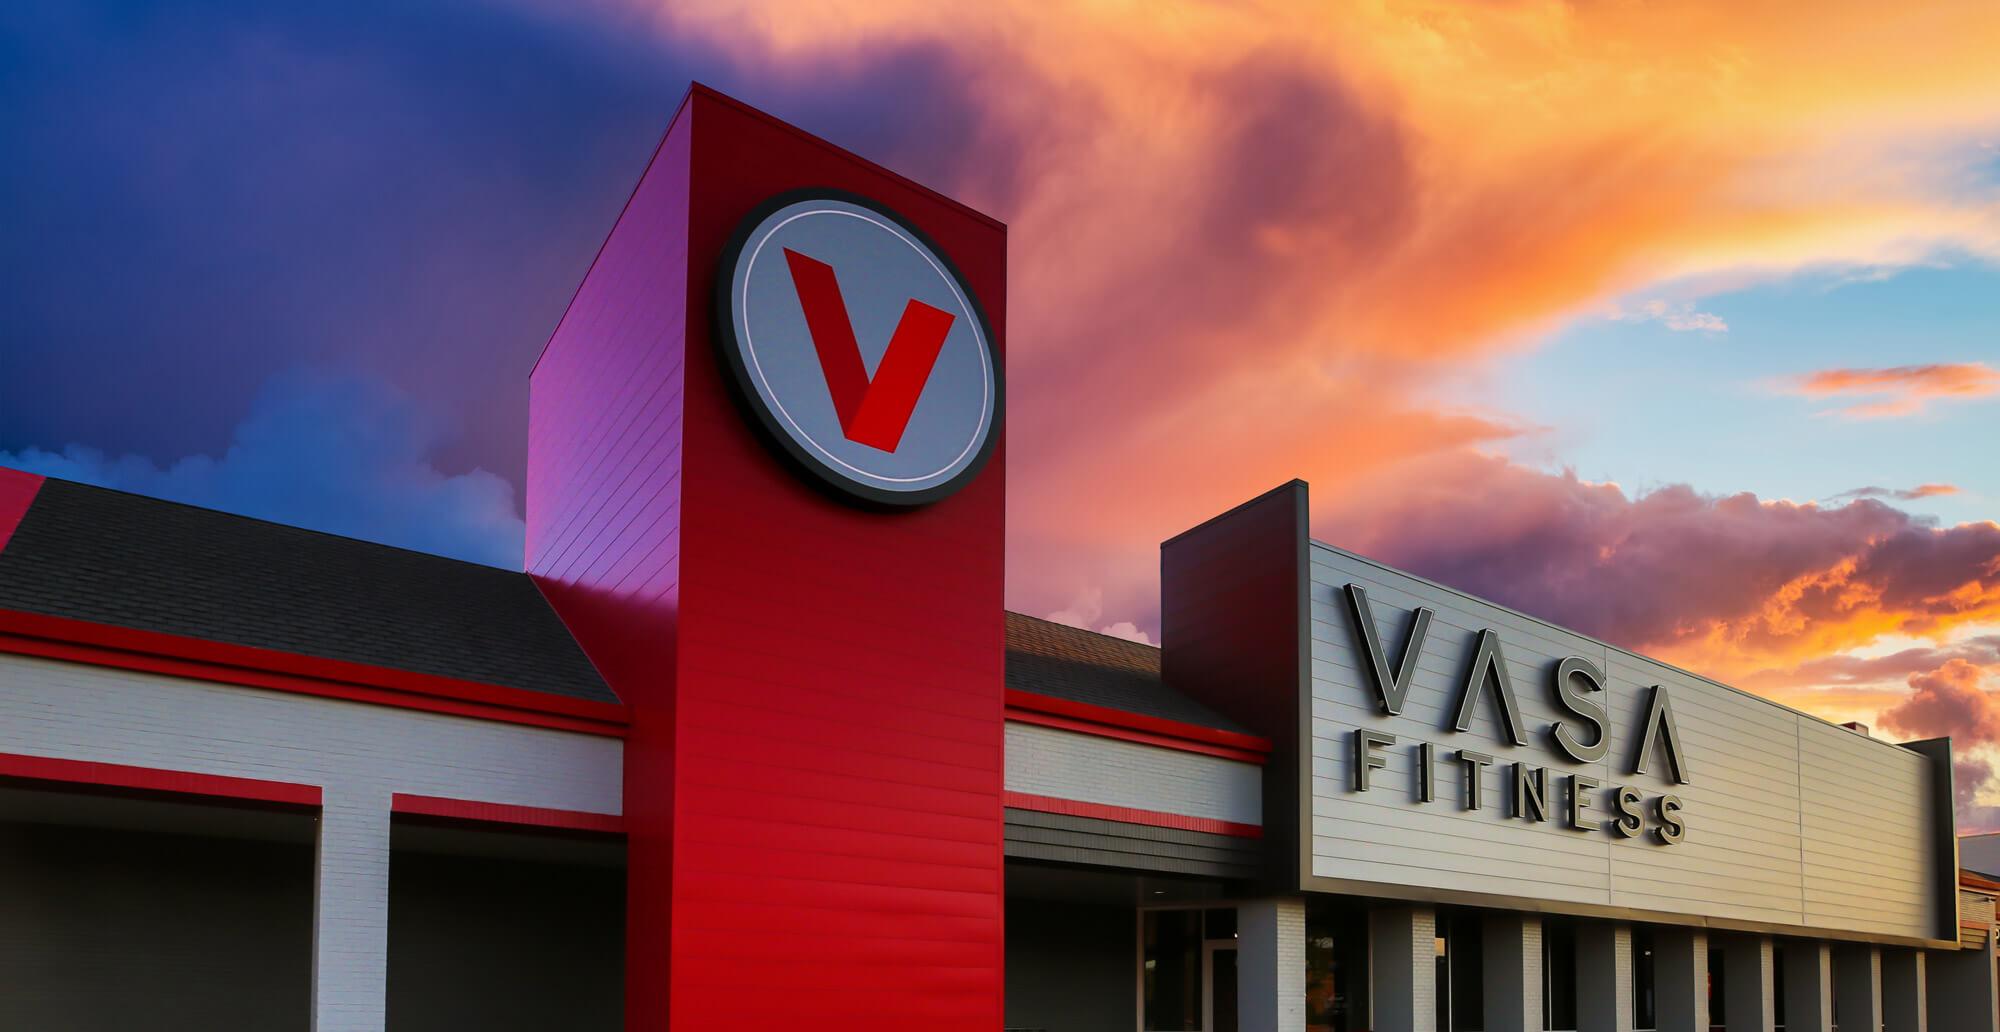 Join Vasa Fitness Affordable Gym Membership